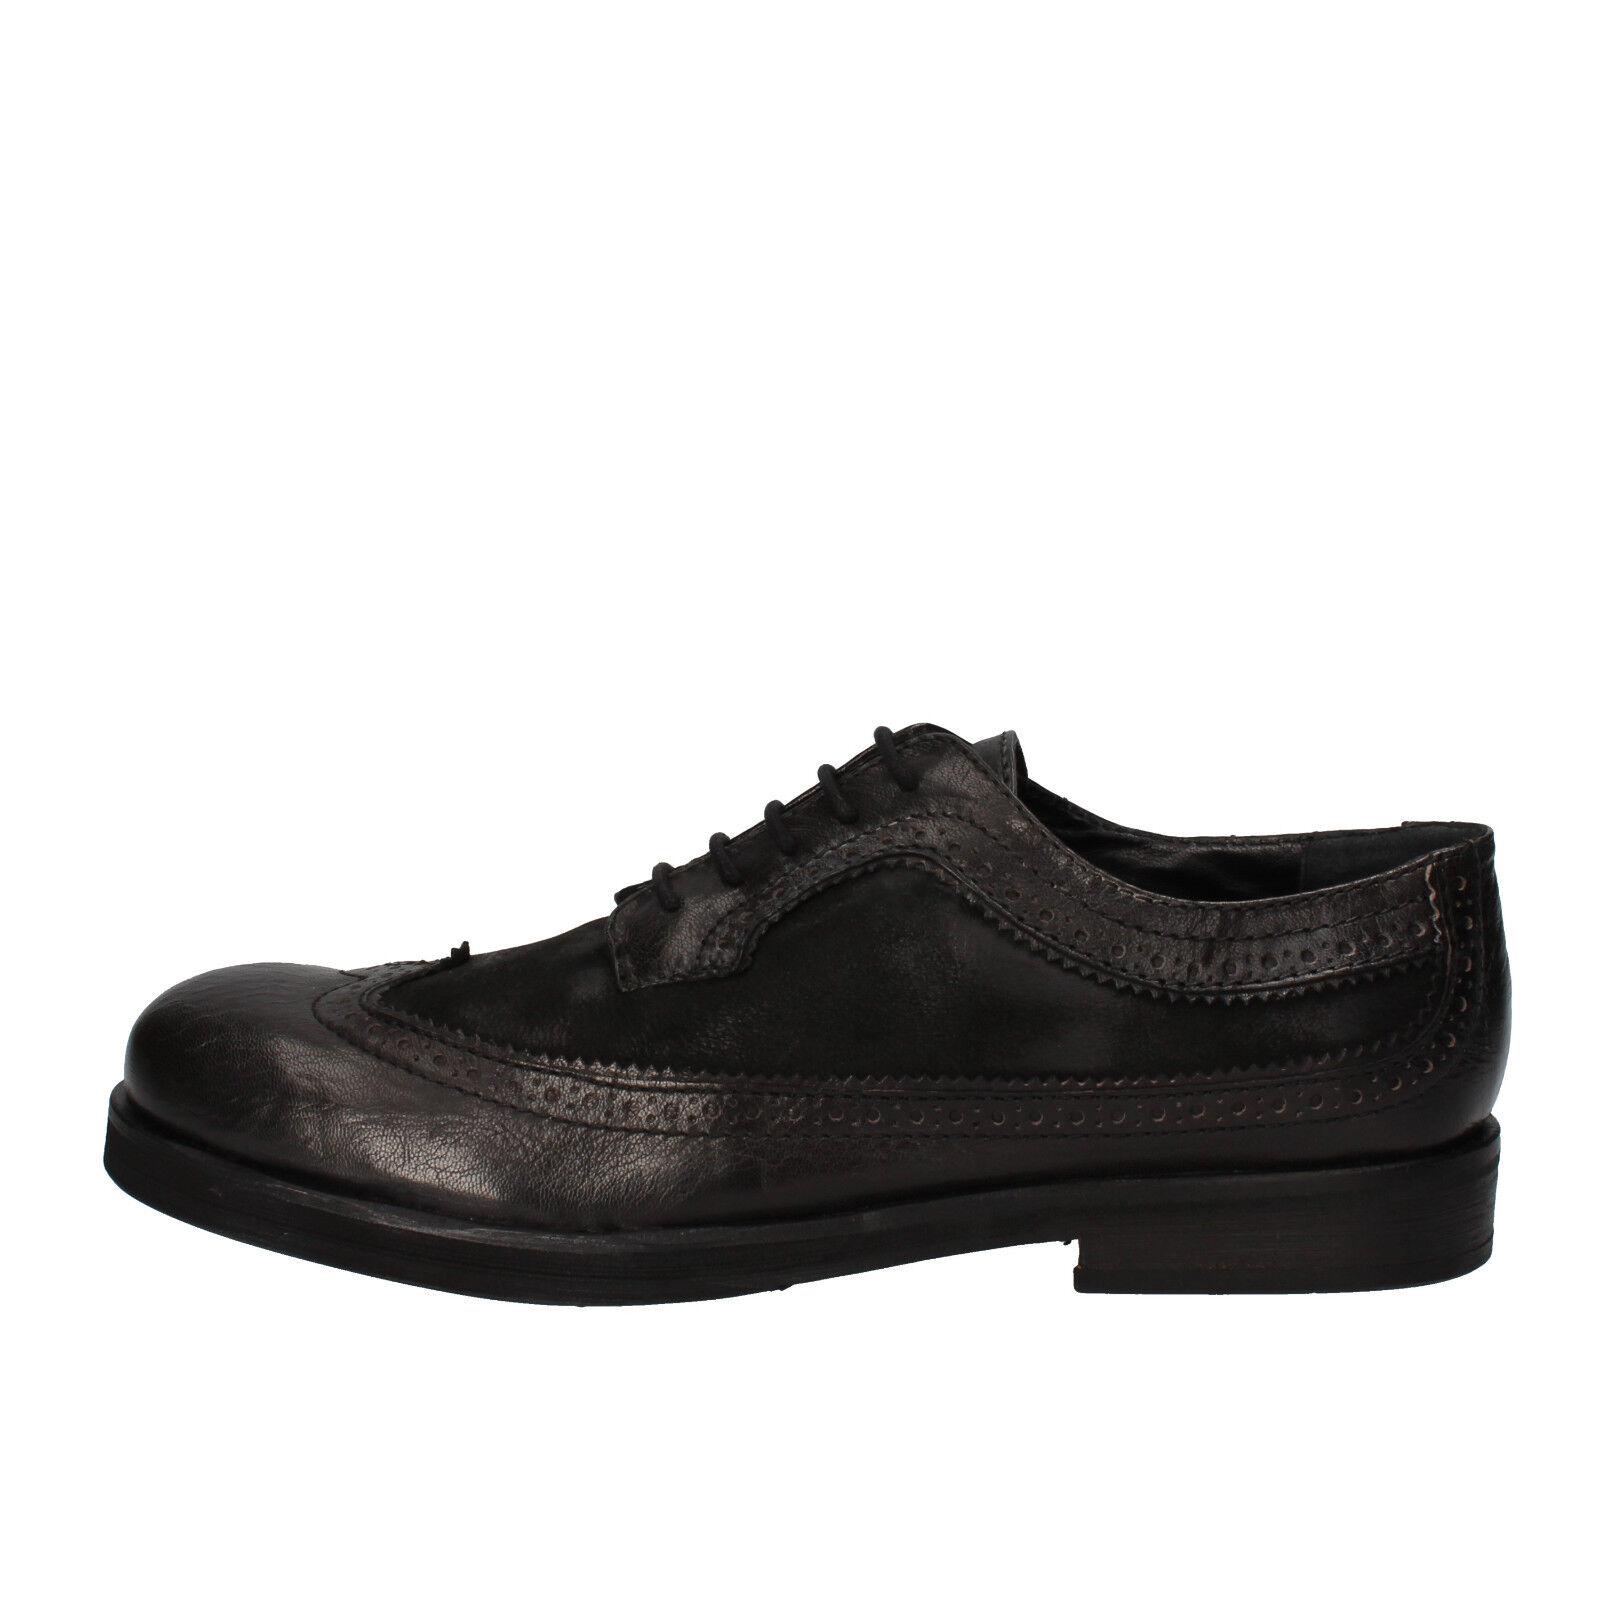 Scarpe da uomo CRIME 8 (EU 42) eleganti neri in pelle e pelle scamosciata AE321-F